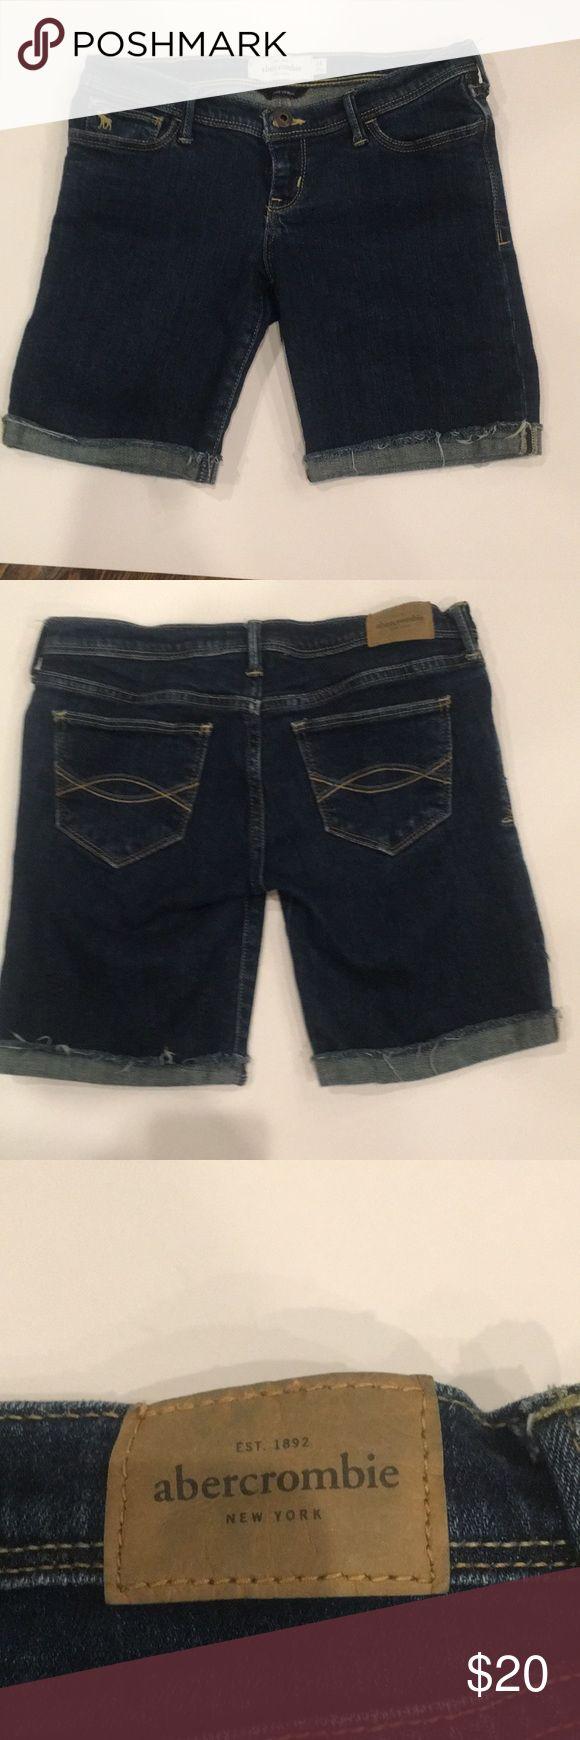 Abercrombie Jean Shorts Size-Girls 14 Abercrombie Jean Shorts with Stretch. Size-Girls 14 abercrombie kids Bottoms Shorts